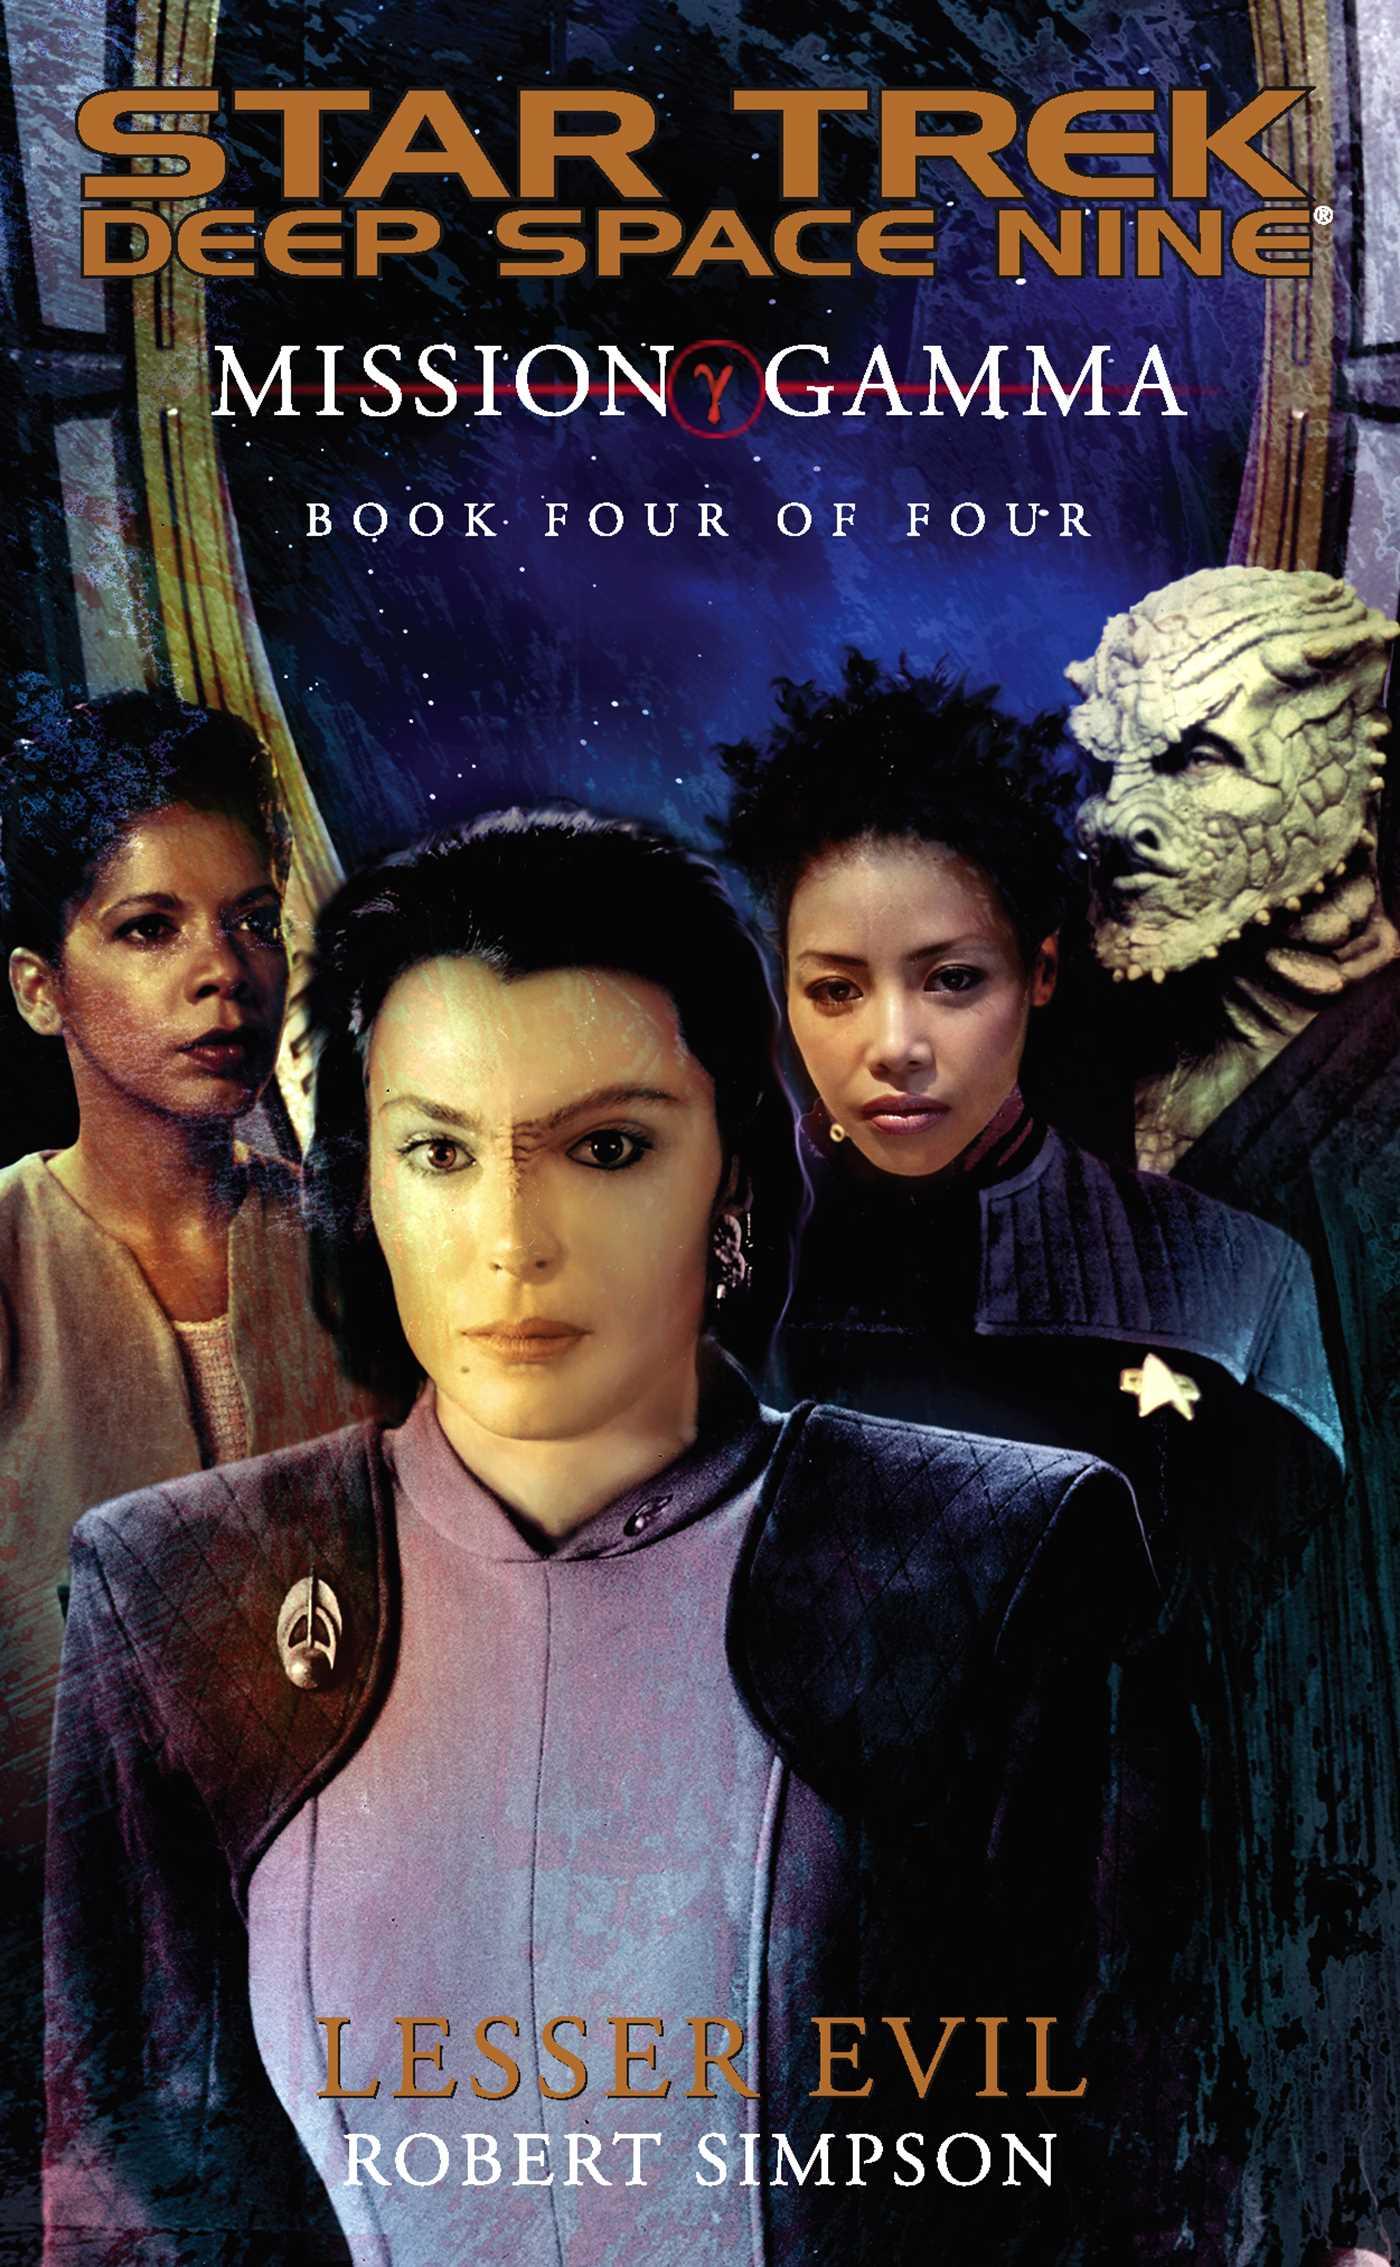 Mission gamma book four 9780743445665 hr